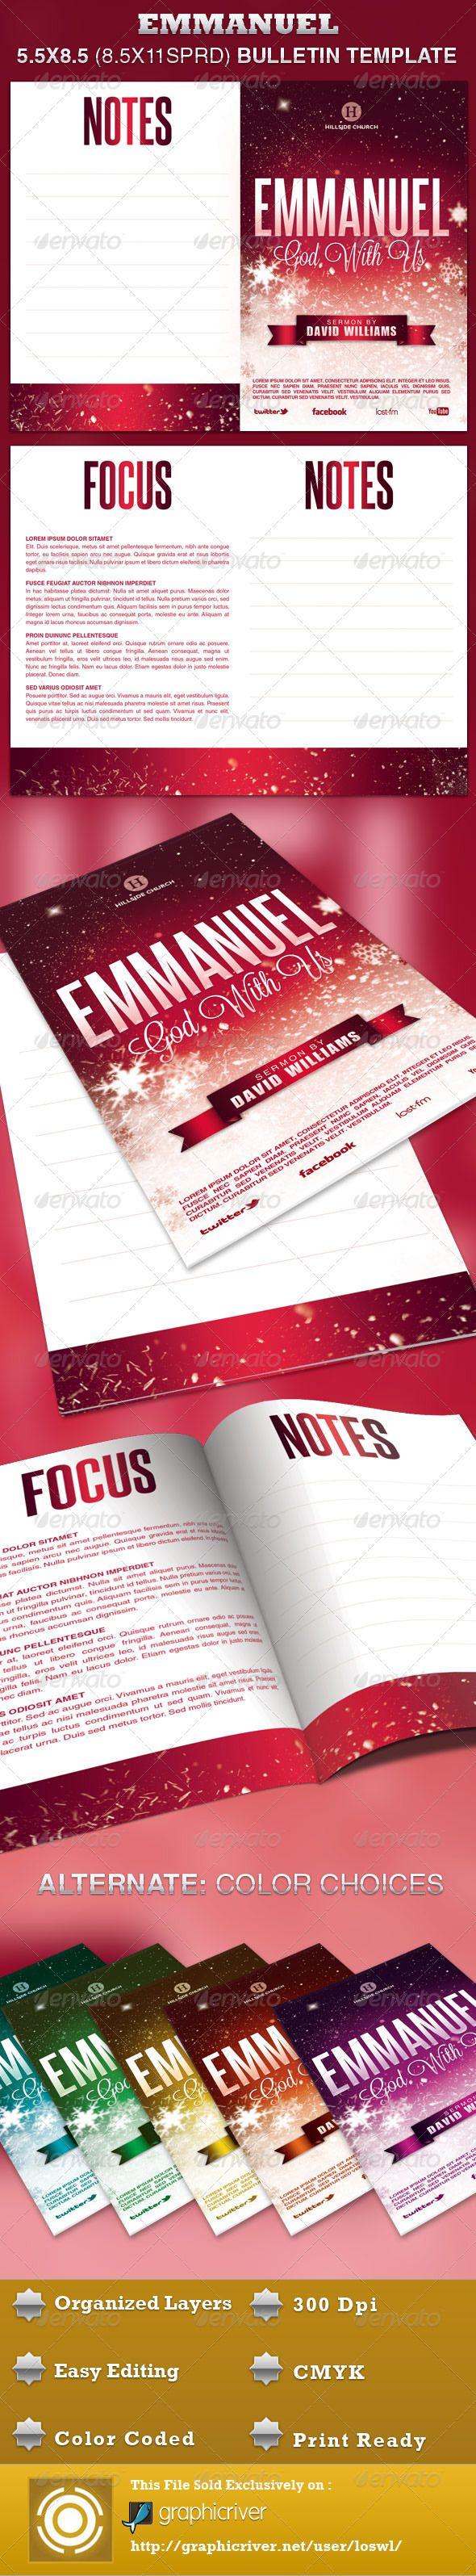 42 best Church Bulletin Templates images on Pinterest | Brochure ...